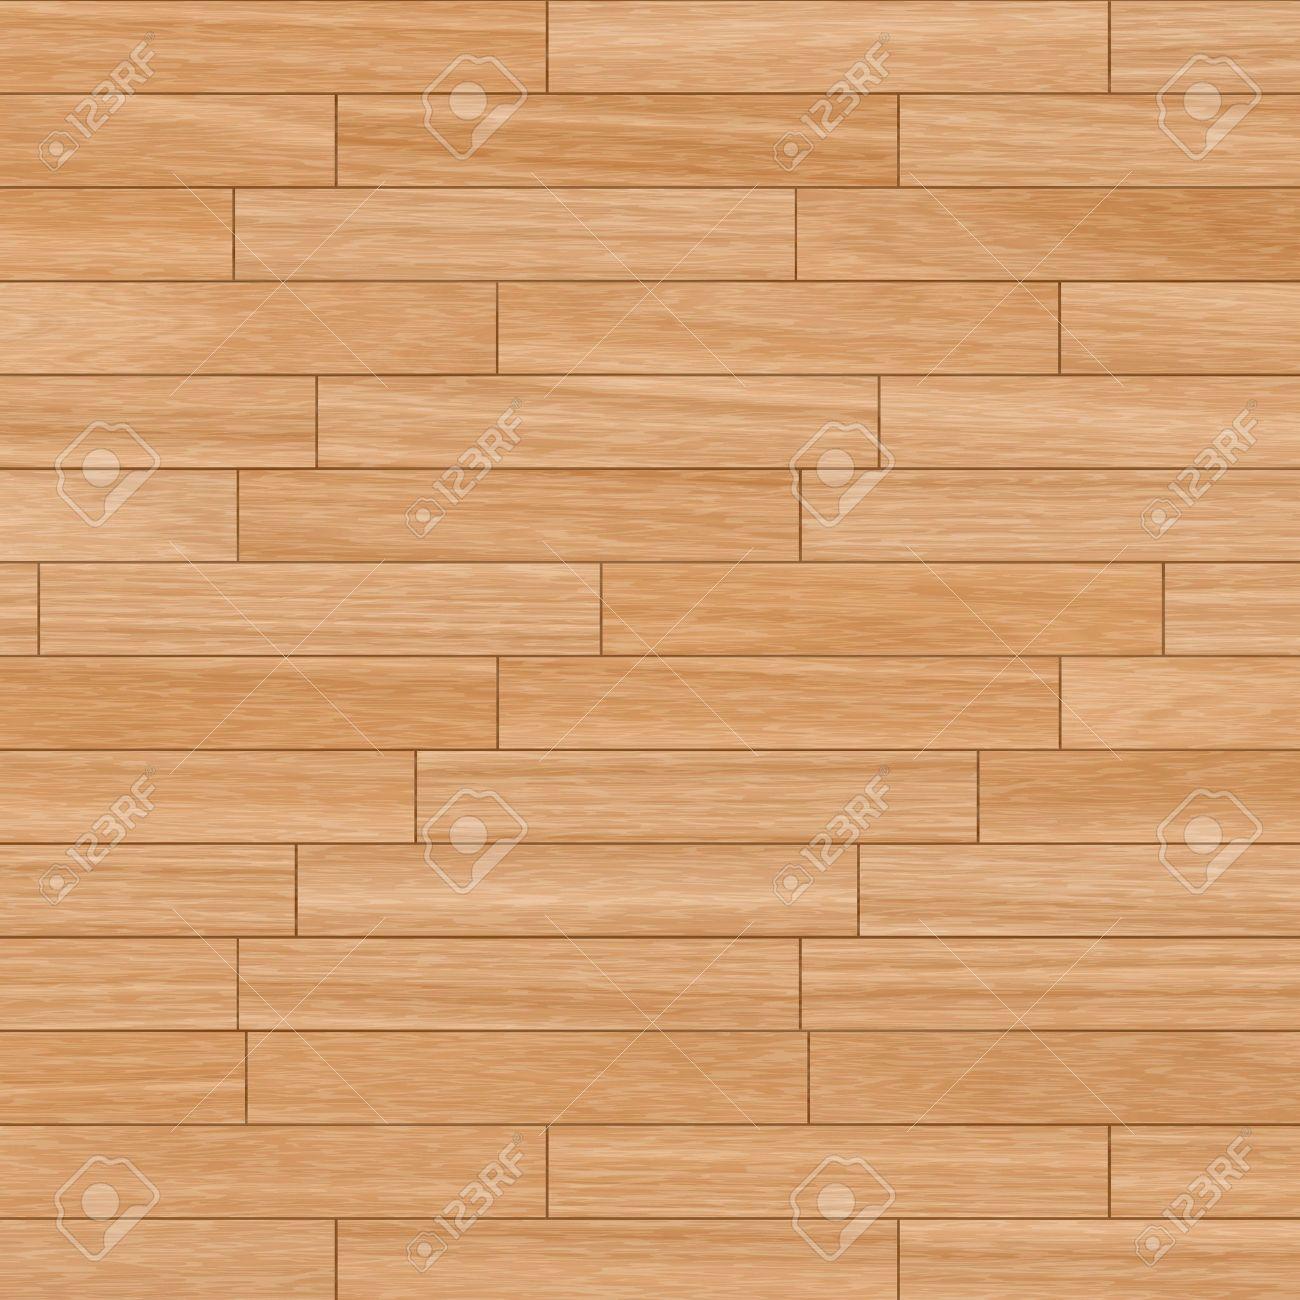 wood flooring texture seamless. wooden parquet flooring surface pattern texture seamless background stock photo 3480854 wood w